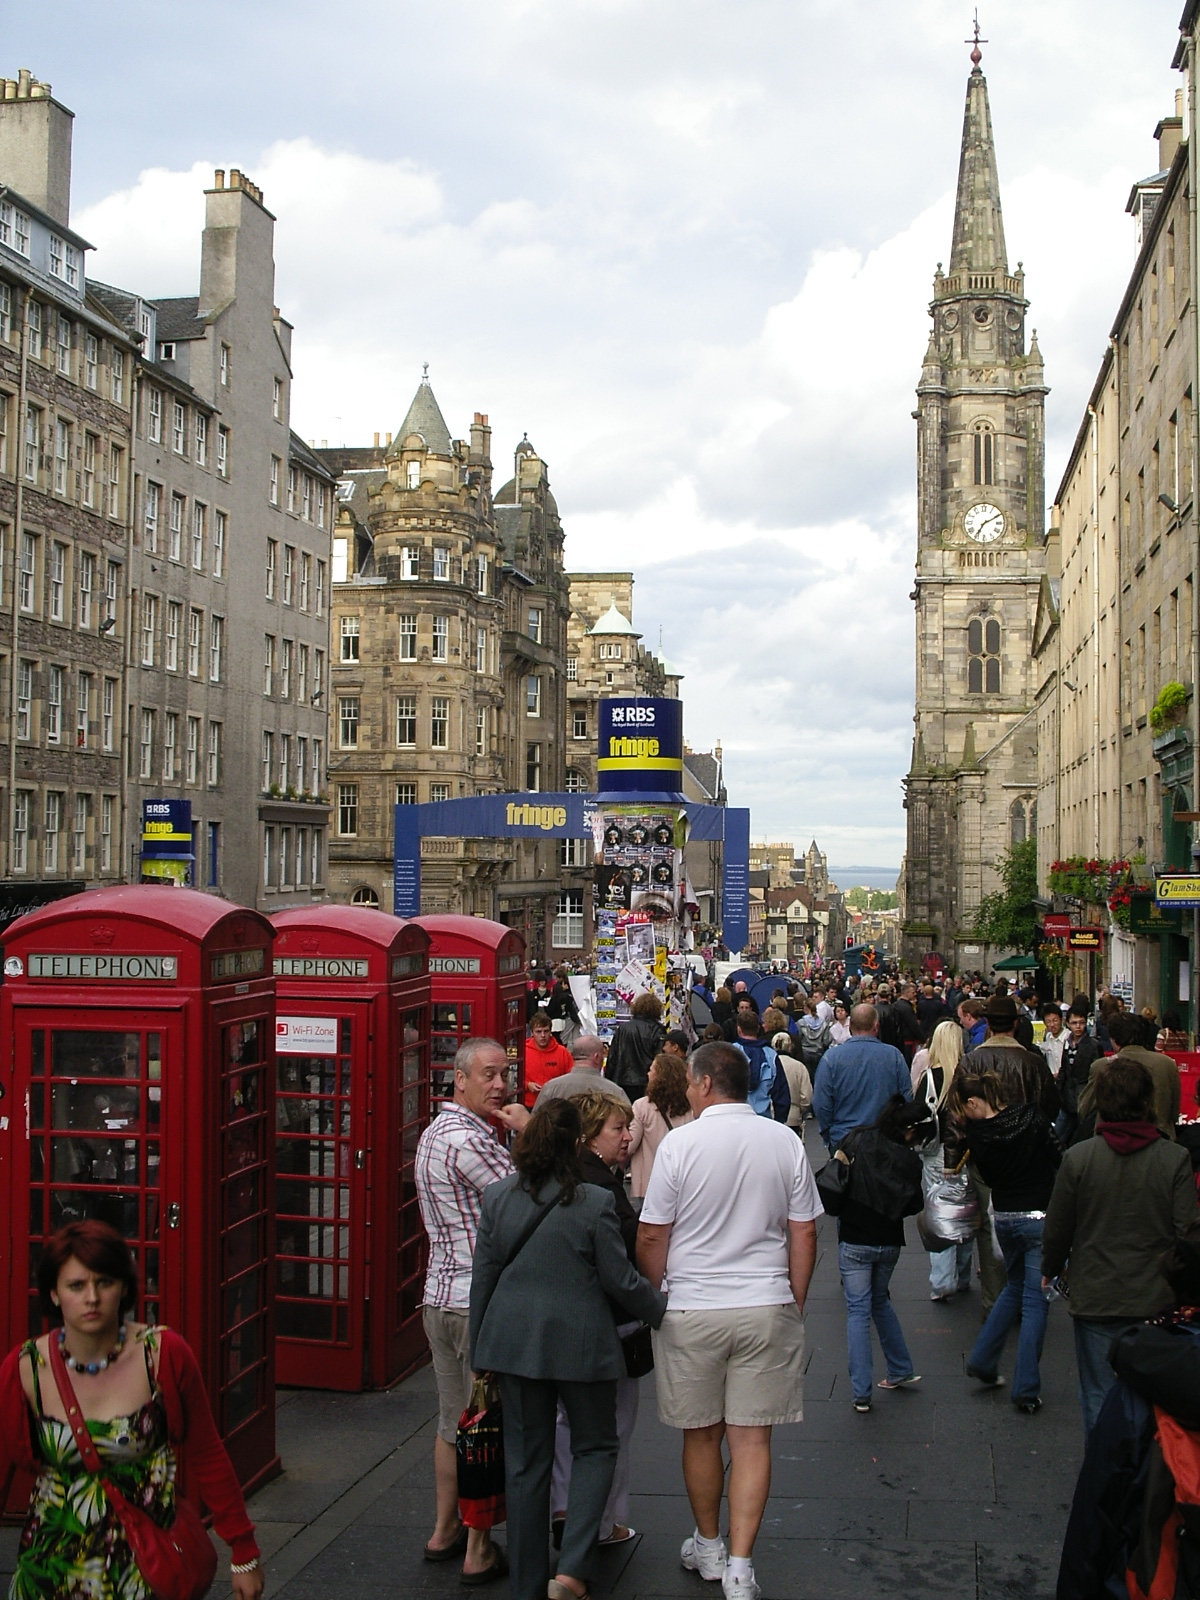 Scenary of Royal Mile, Edinburgh